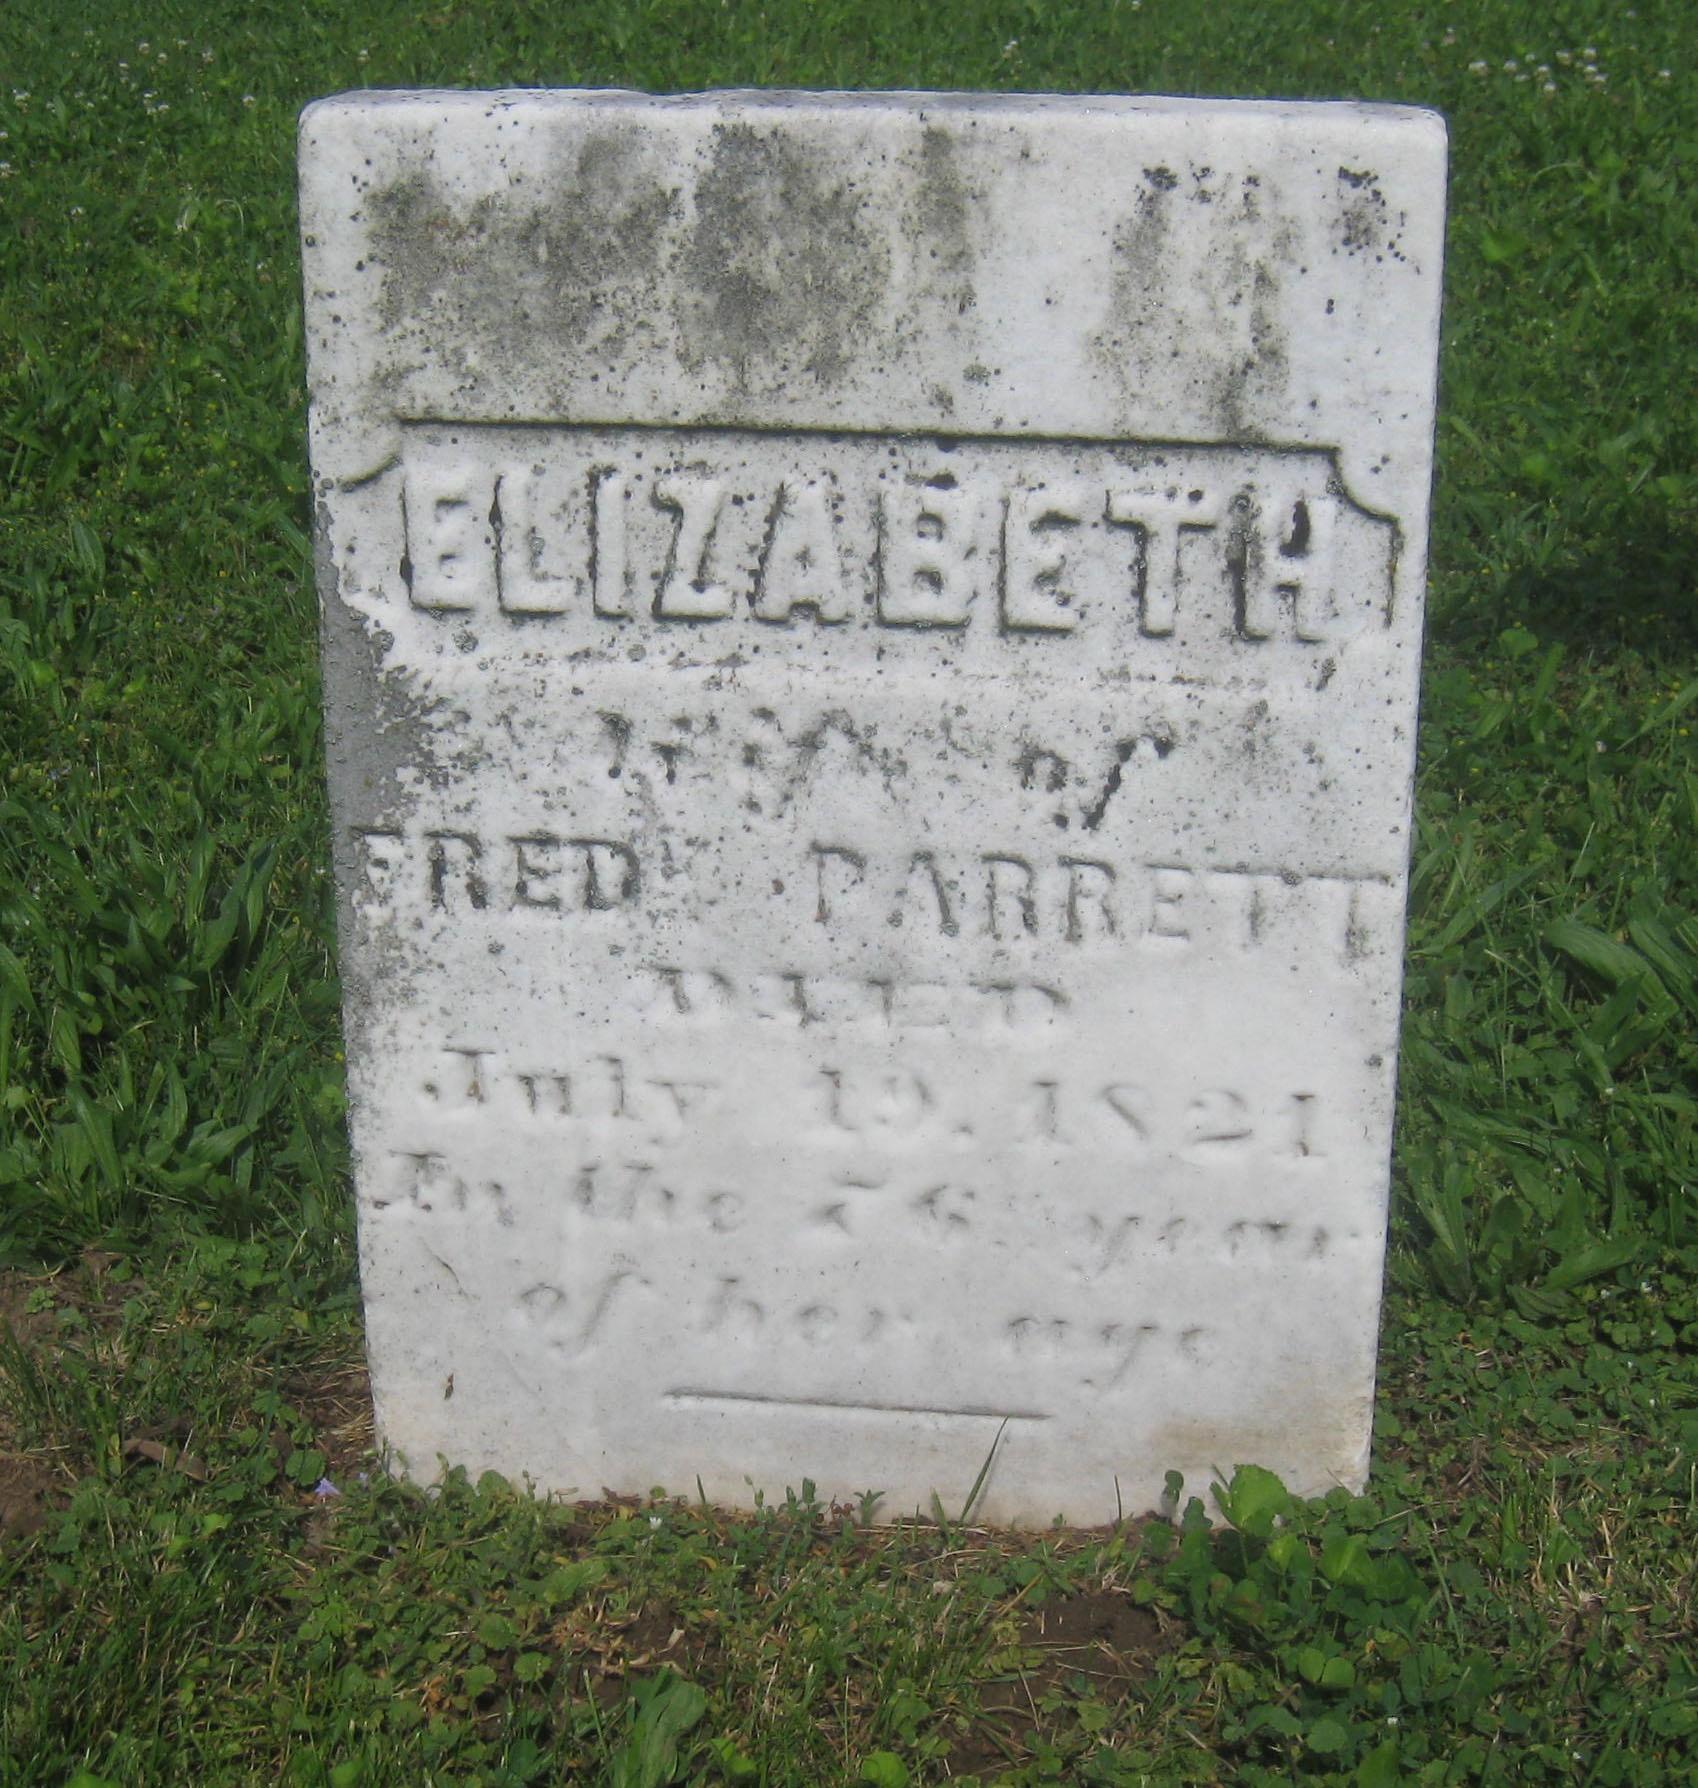 Elizabeth Parrett.jpg